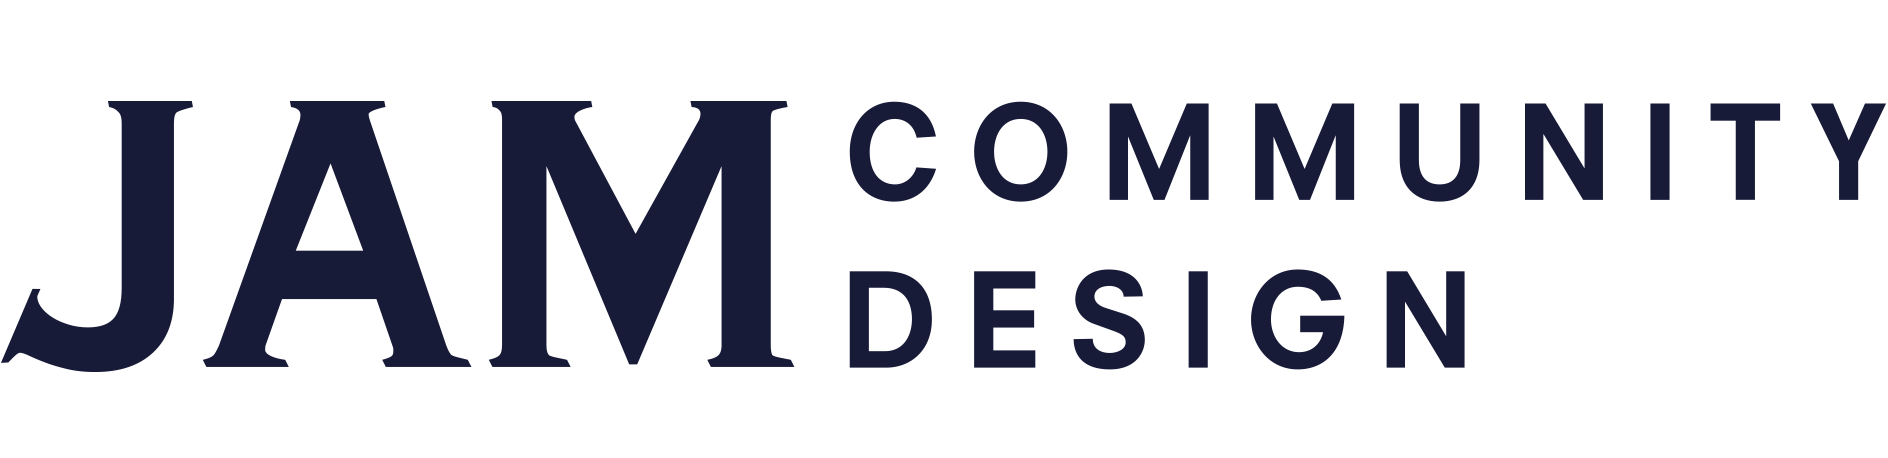 株式会社JAM Community Design